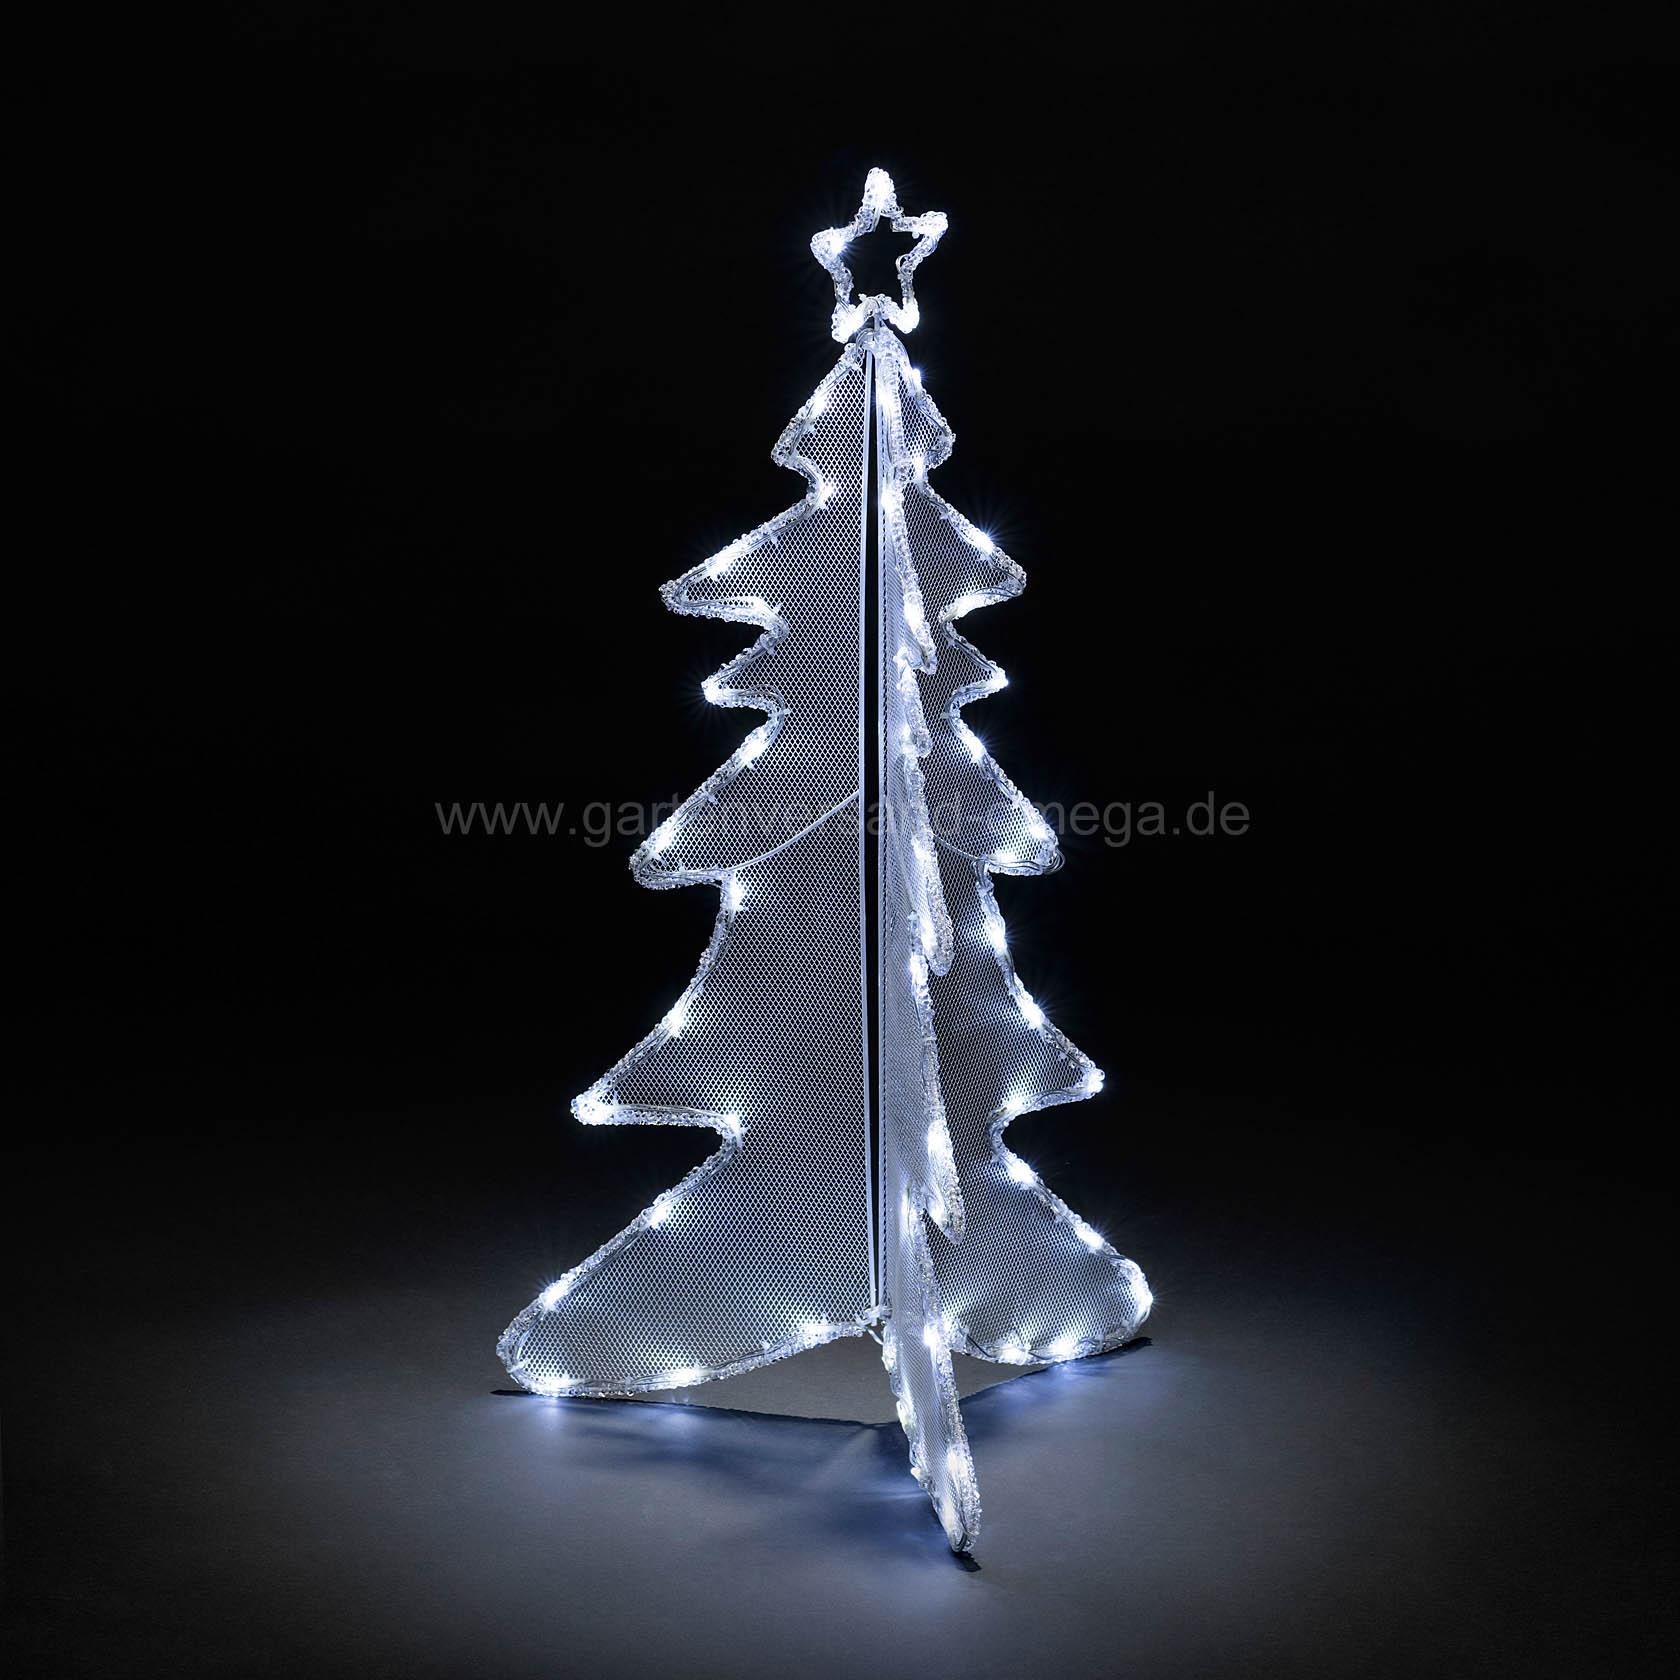 3d led acryl tannenbaum 90cm leuchtbaum beleuchteter baum acrylfiguren dekoration. Black Bedroom Furniture Sets. Home Design Ideas